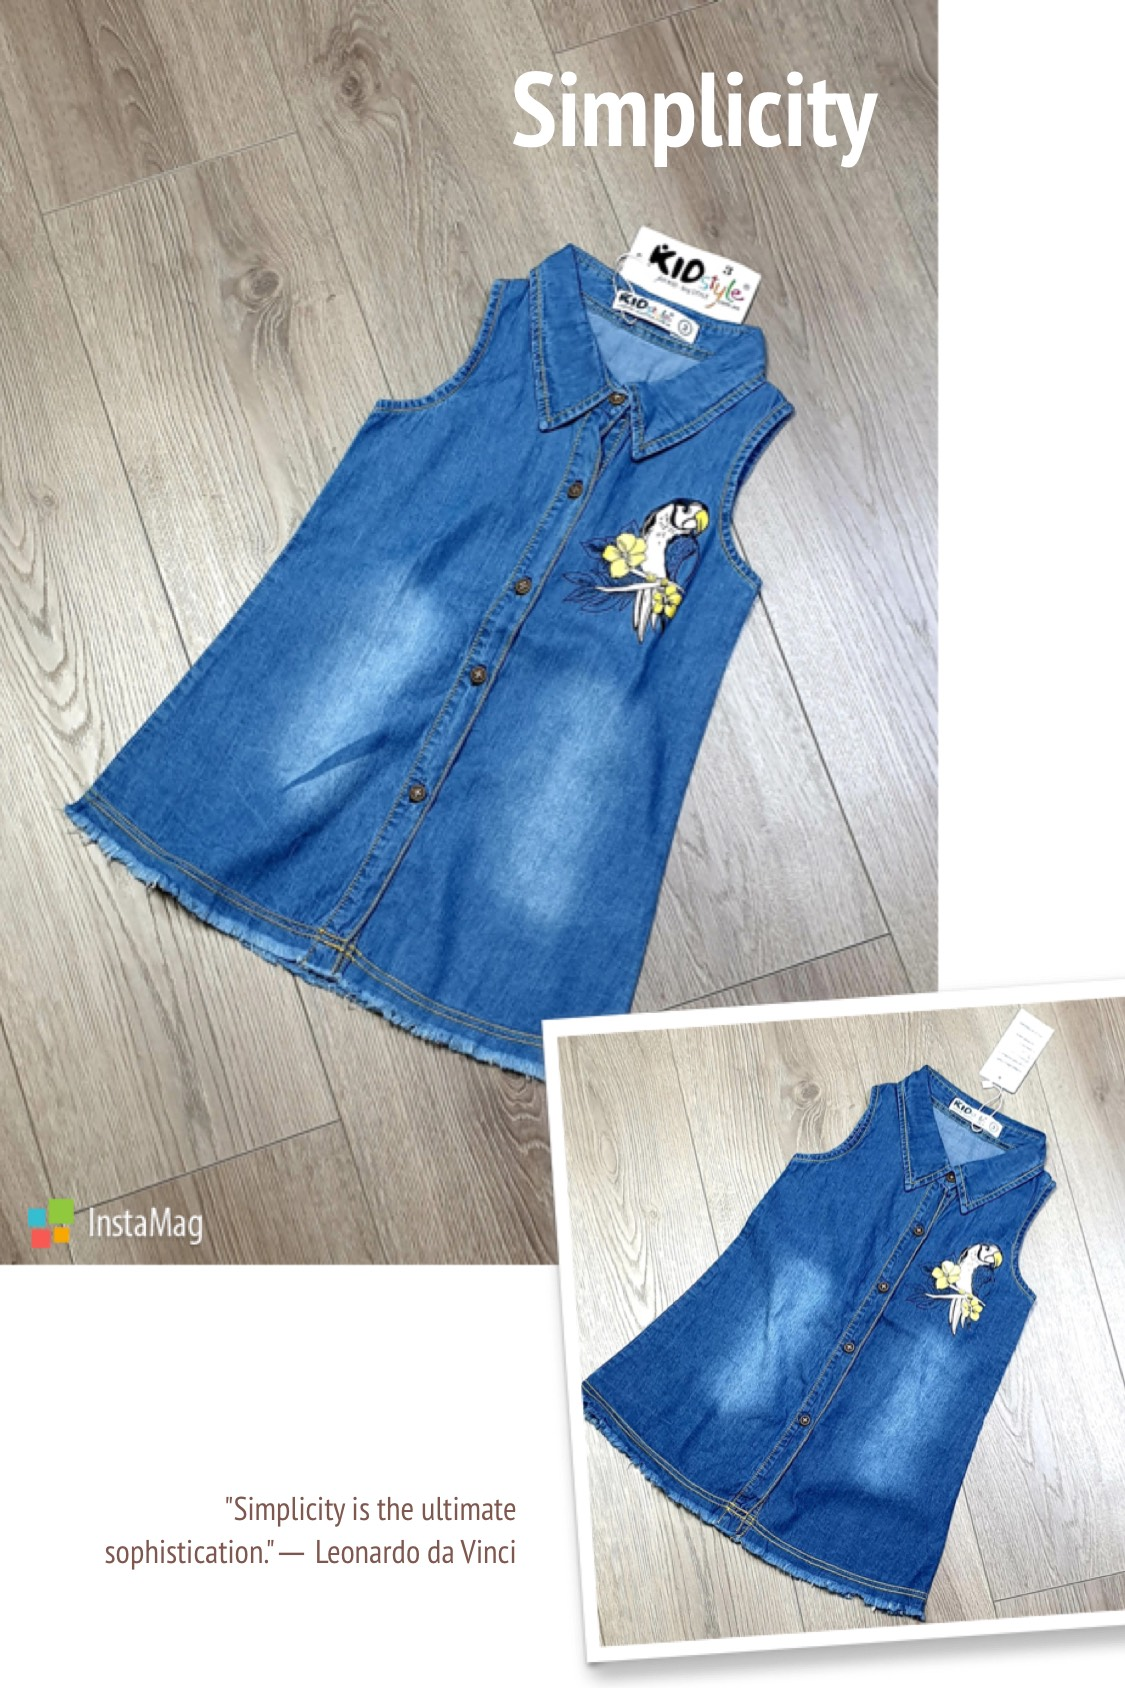 Đầm jean KIDSTYLE Style Đầm Sơmi- in Con Vẹt. Chất jean cotton đẹp- Form lớn  Size: 1-8 Size: 9-14